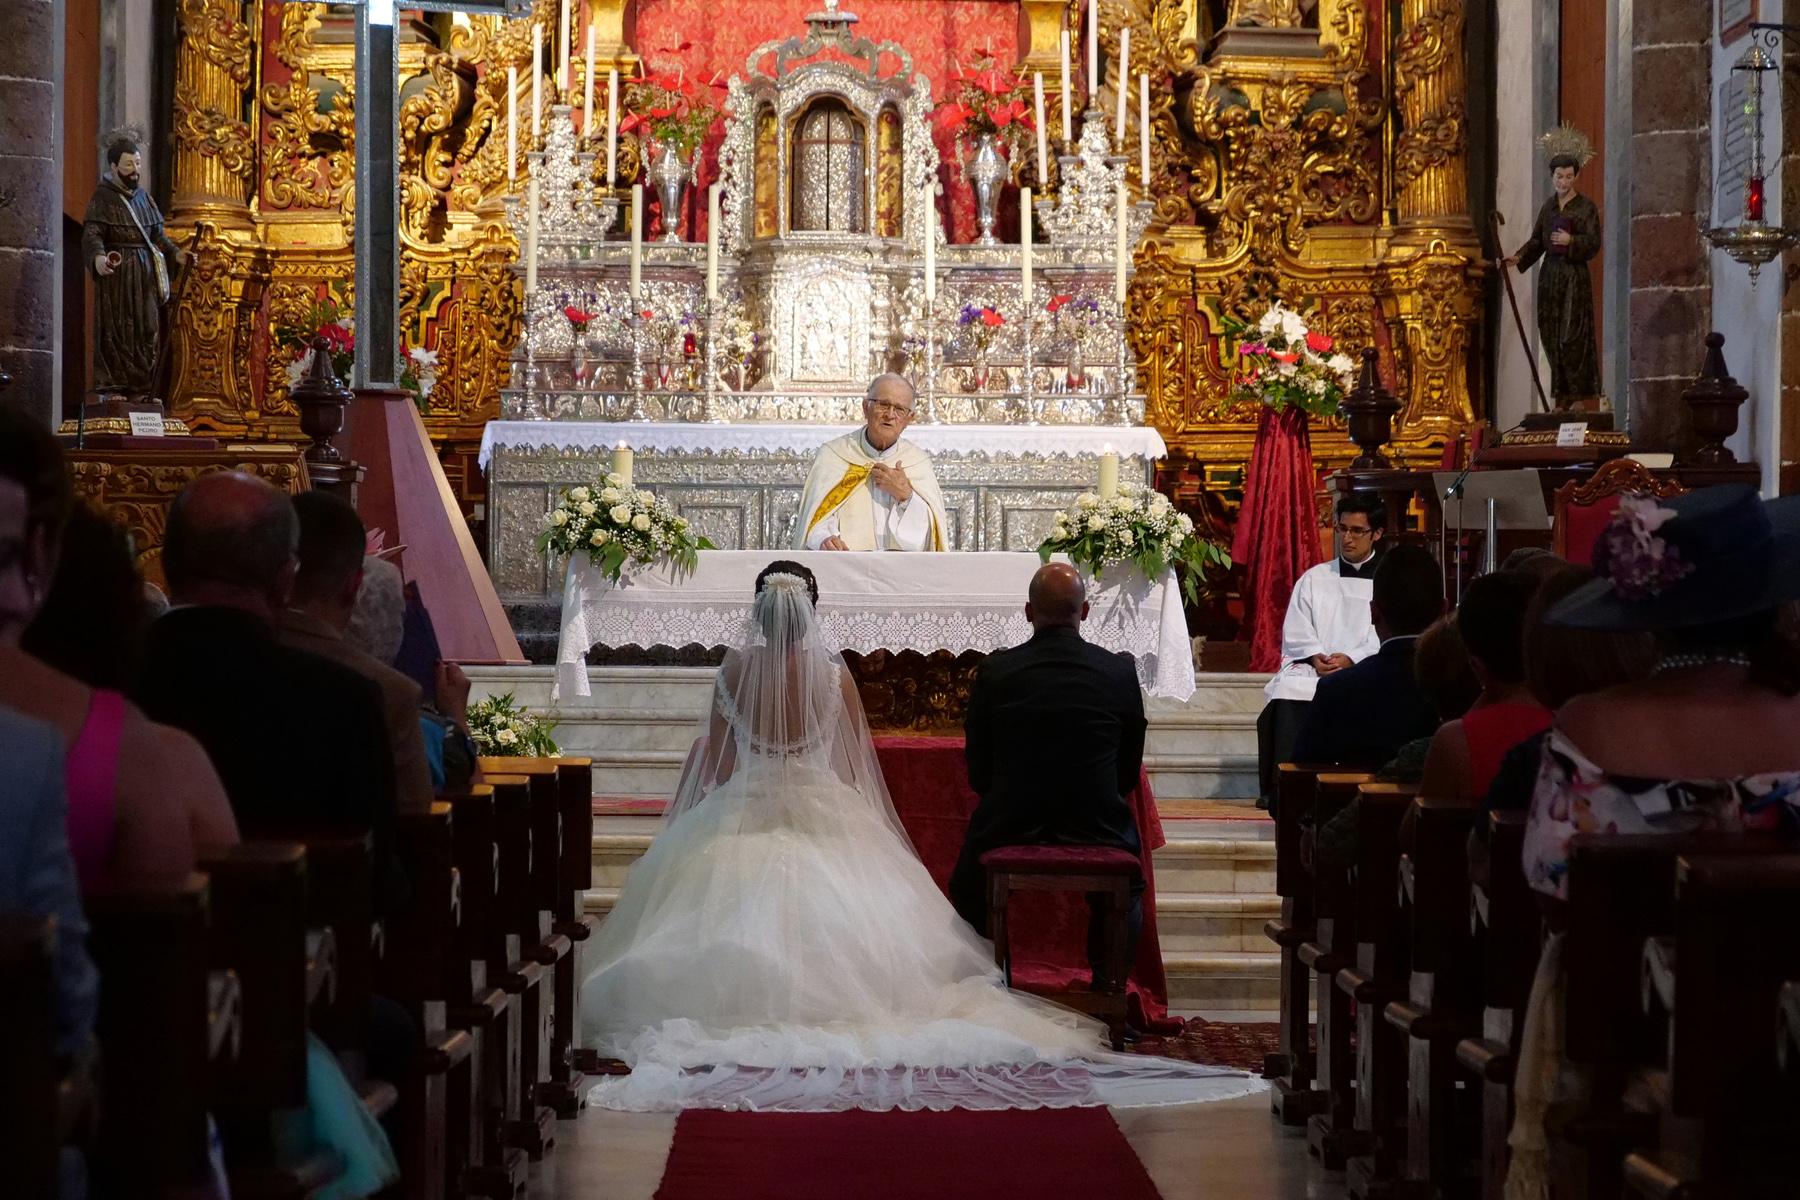 religious wedding in spain